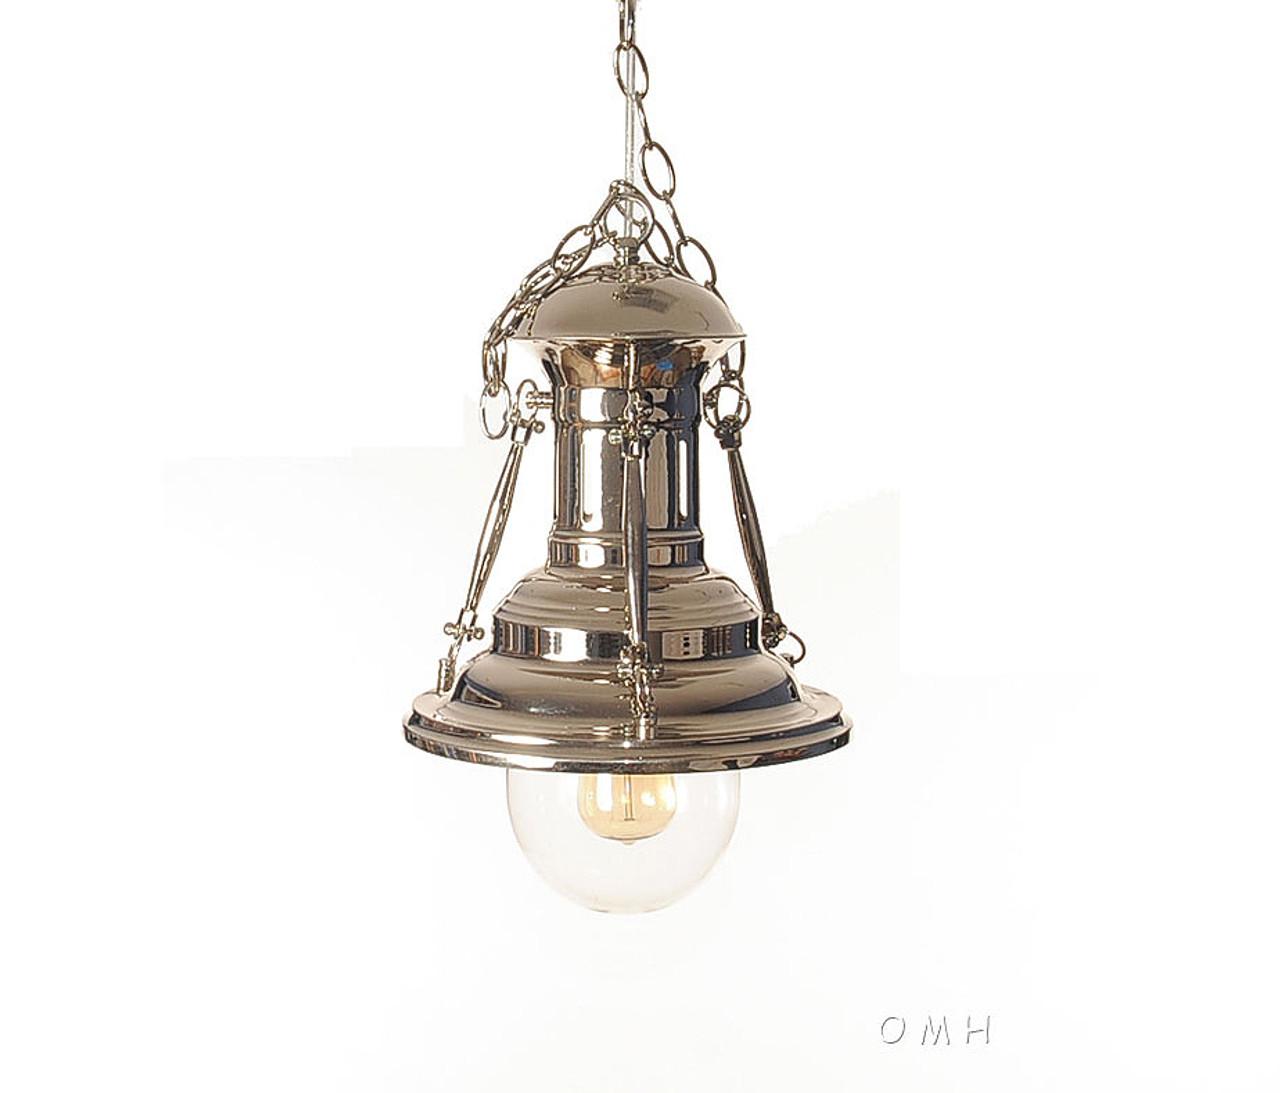 Nautical Chrome Metal Pendant Hanging Lamp Turnbuckle